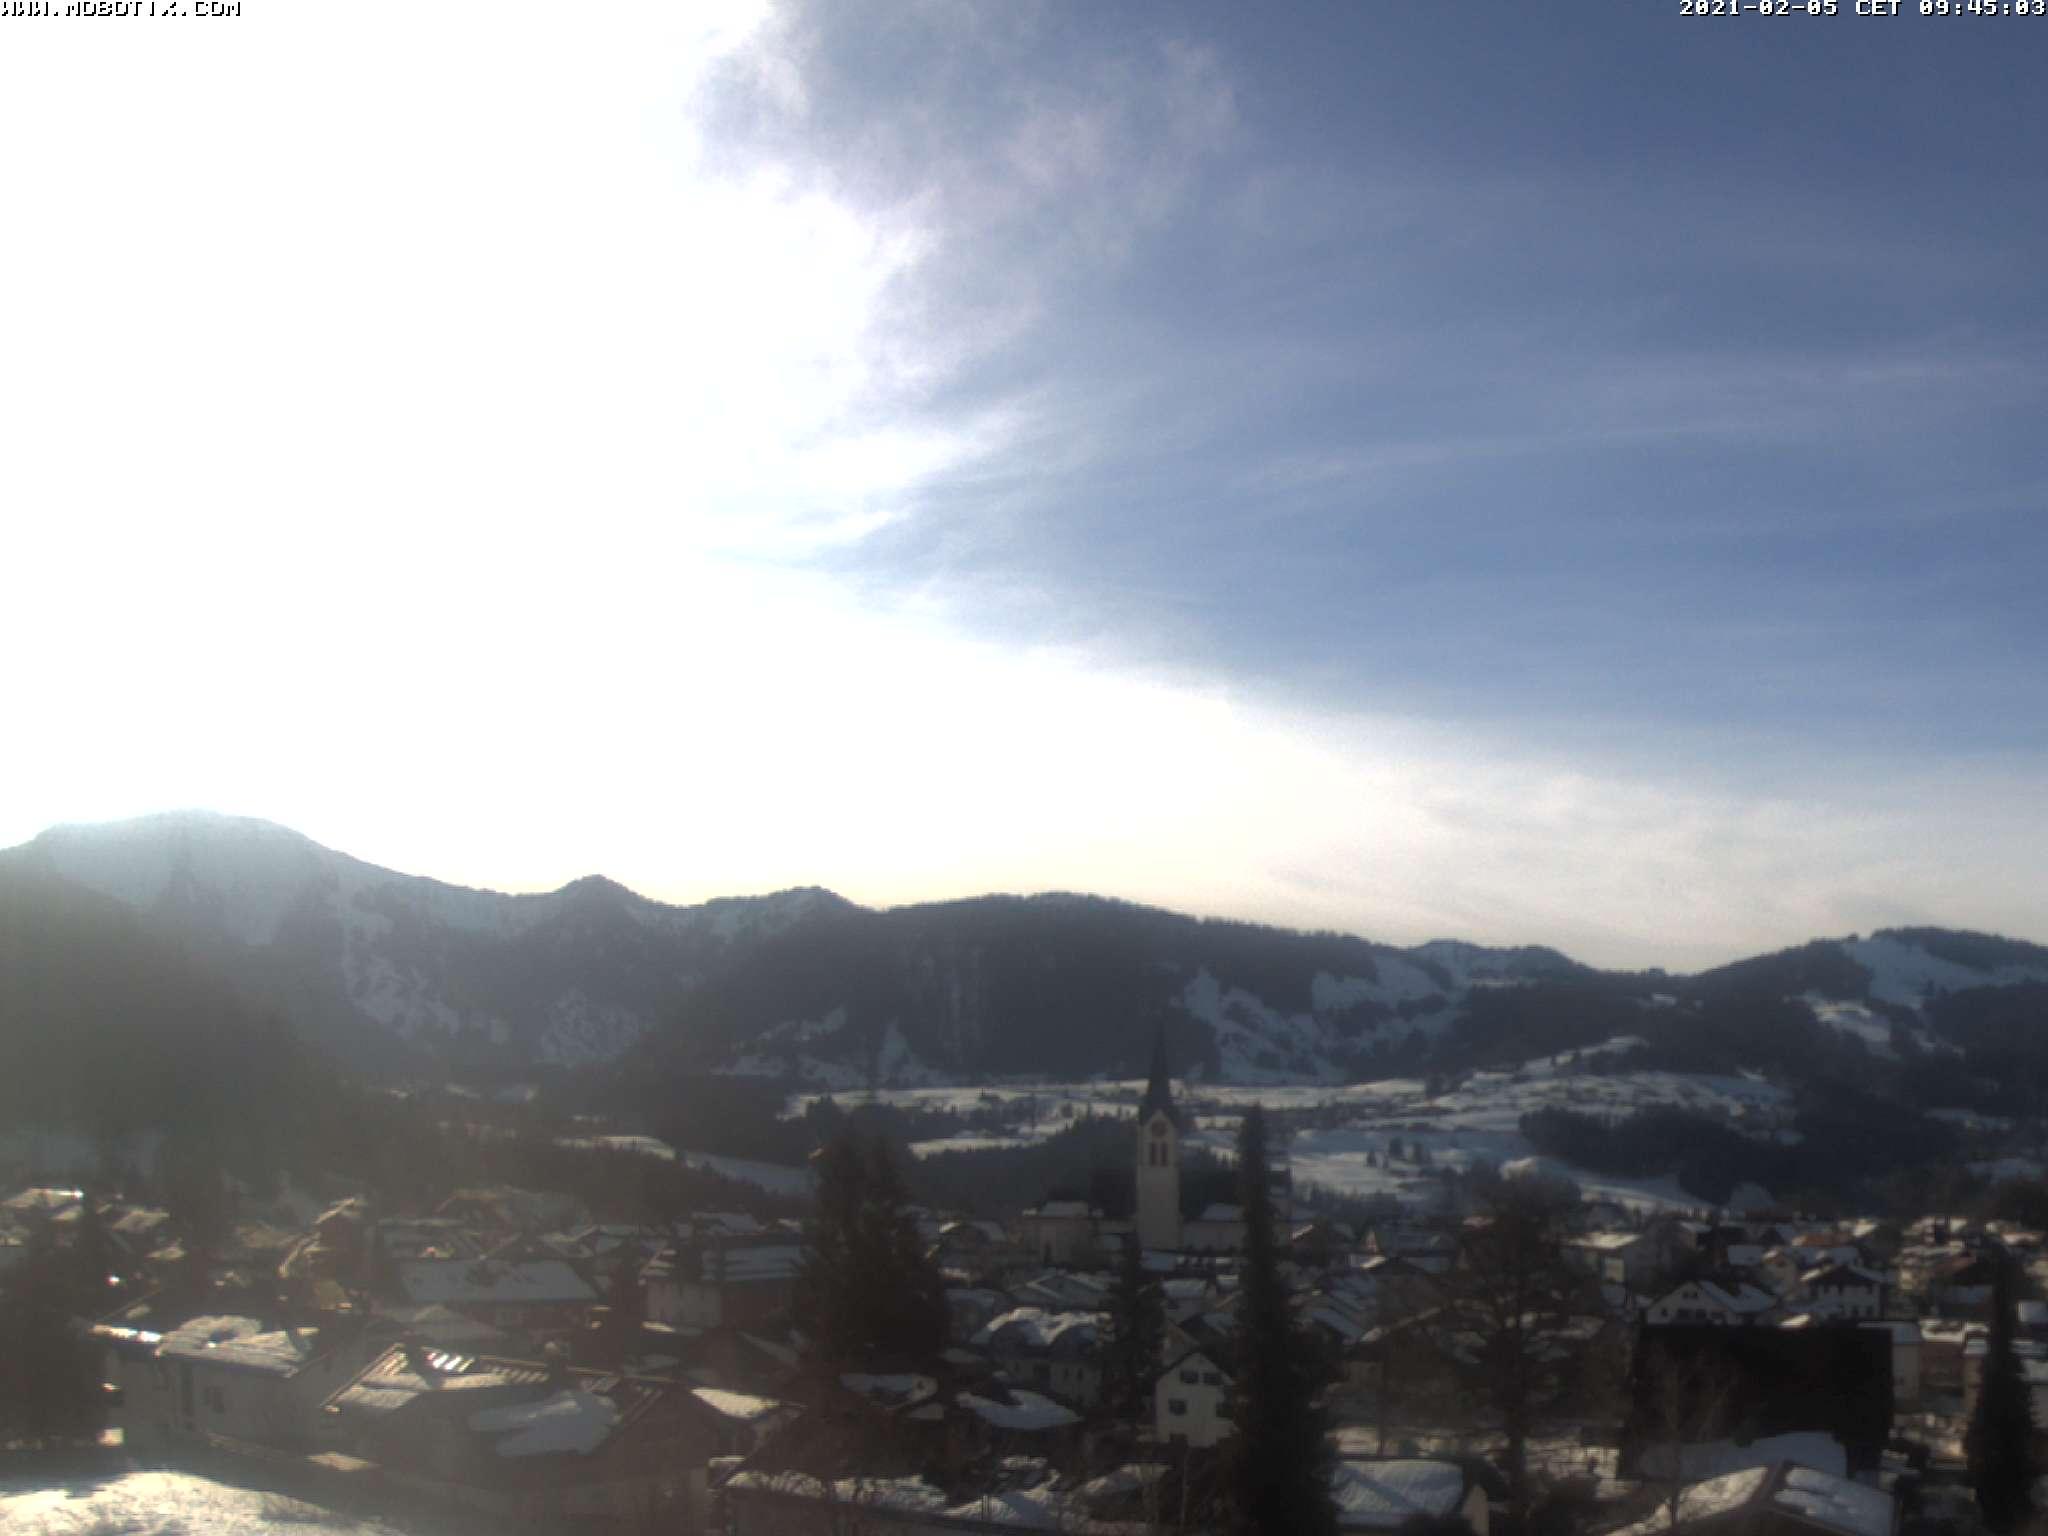 Webcam Skigebiet Oberstaufen - Hochgrat cam 4 - Allgäu